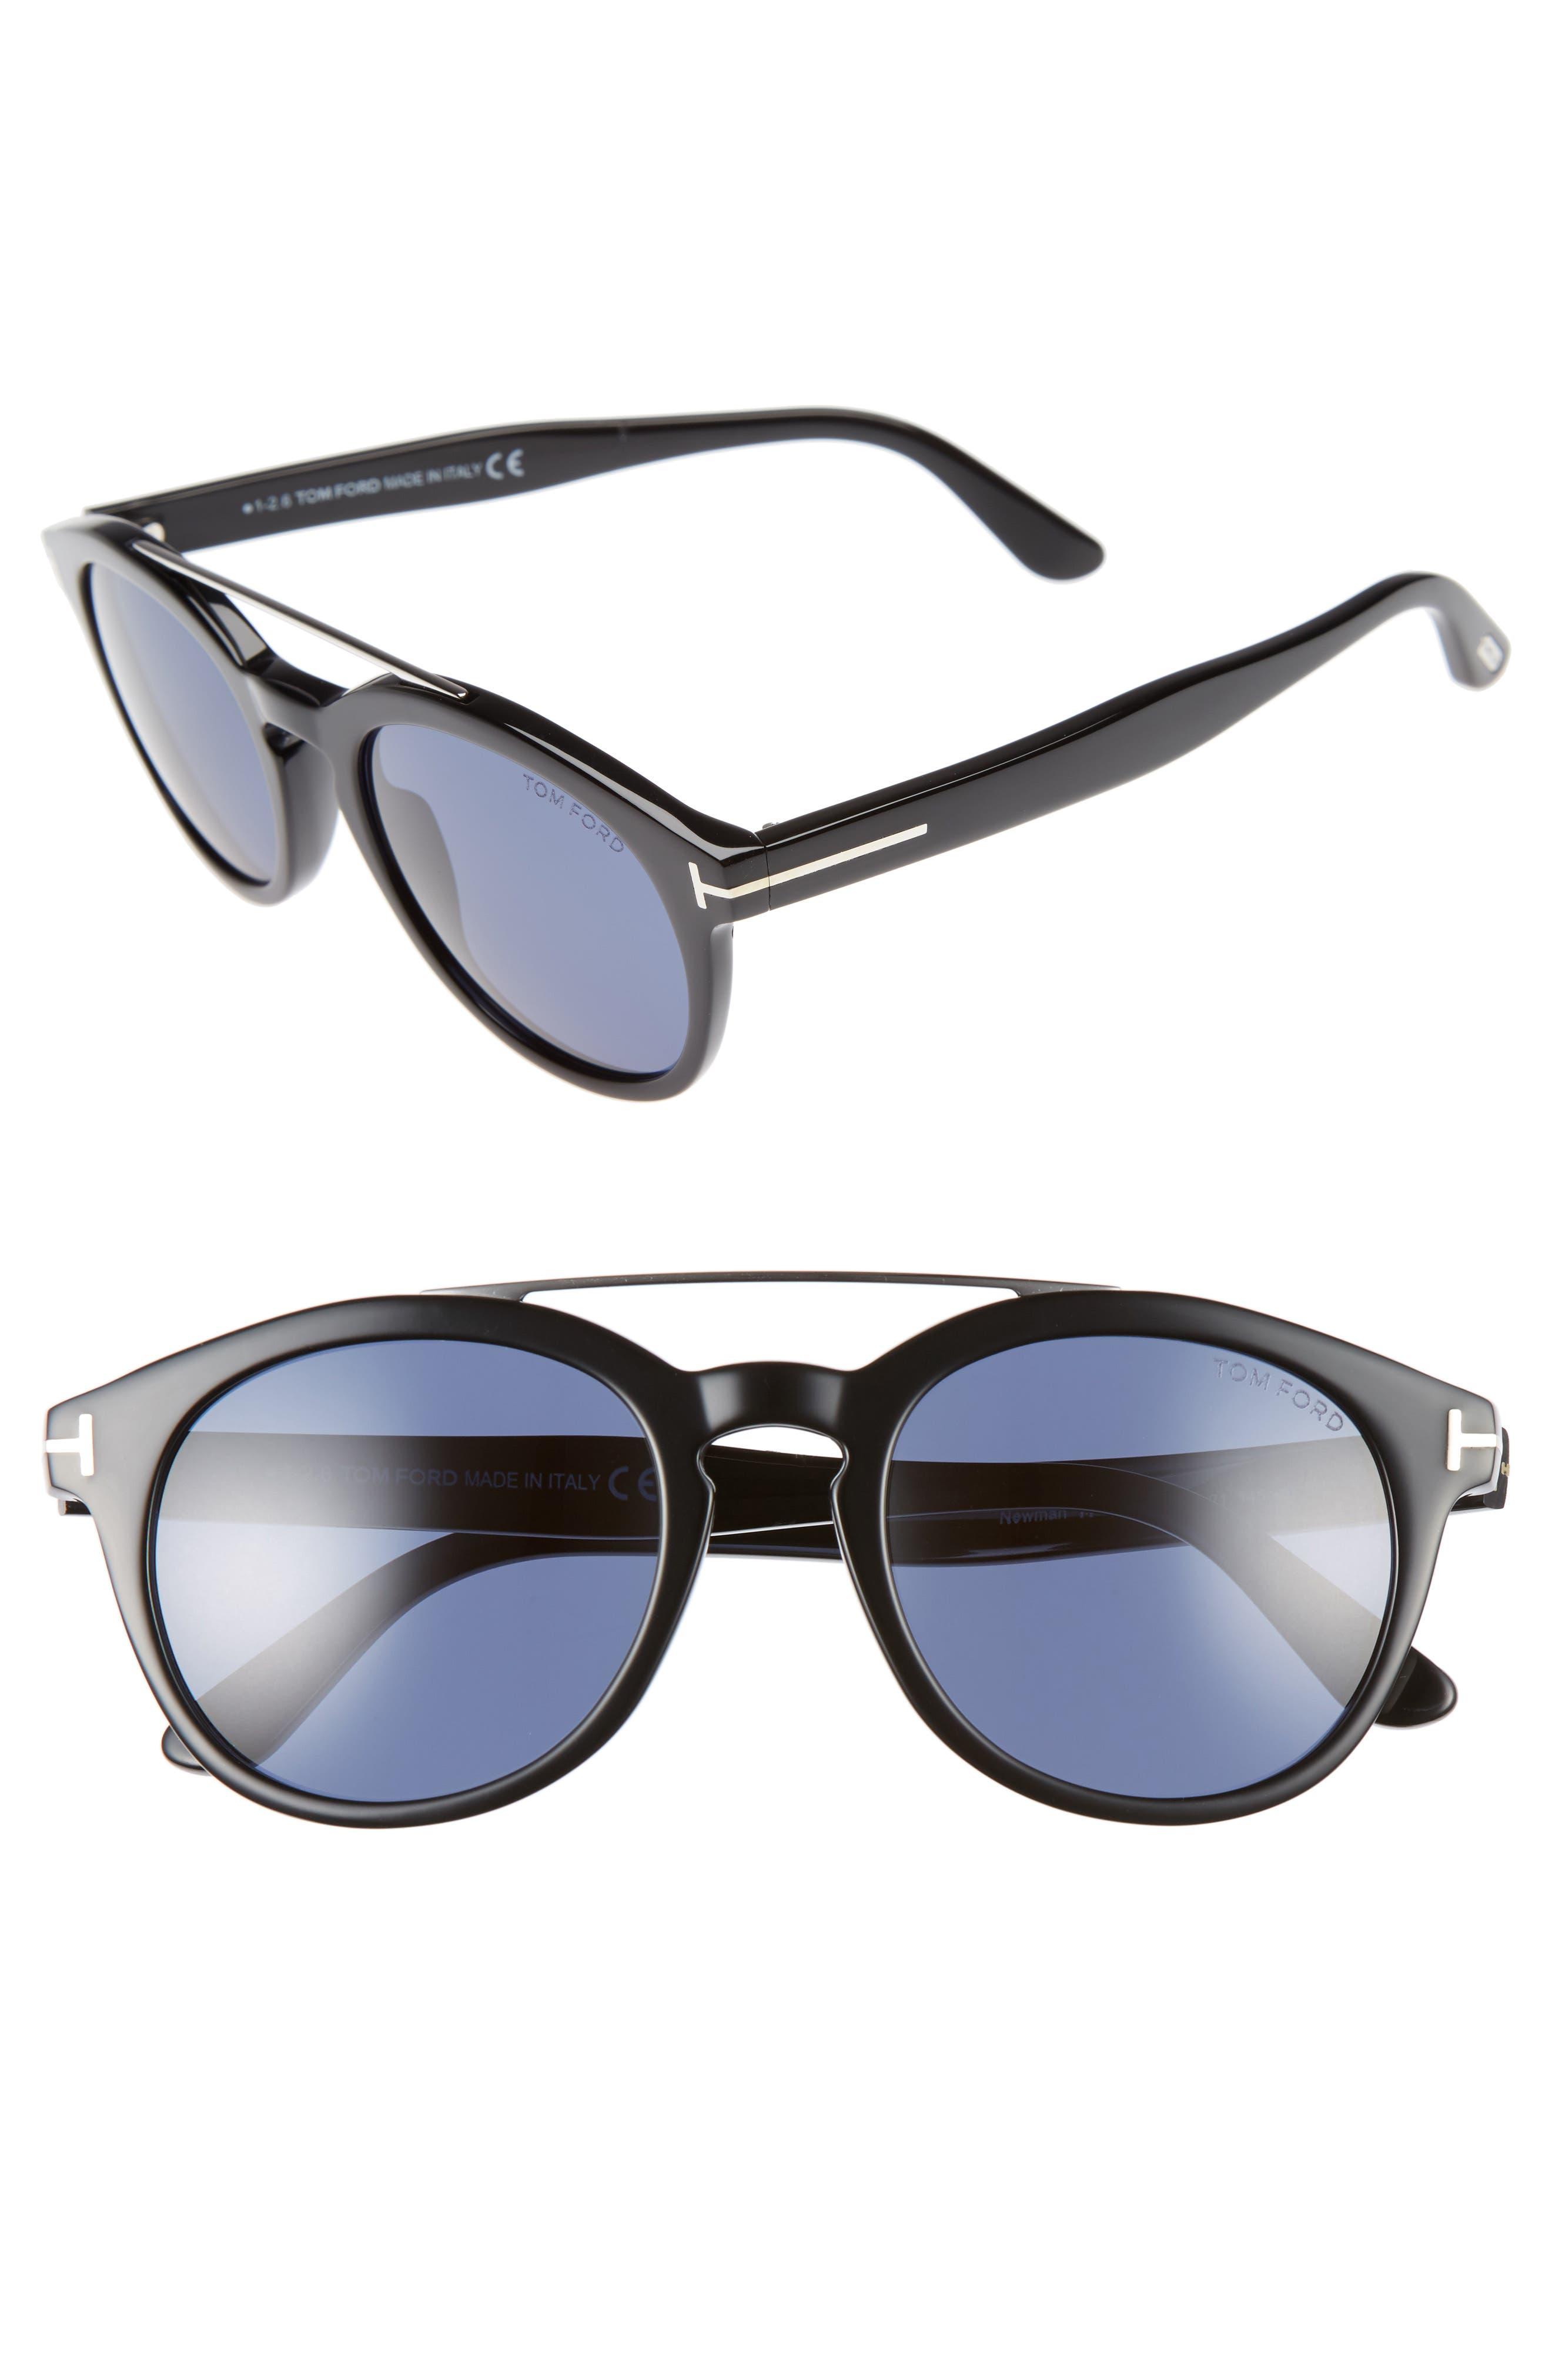 Newman 53mm Polarized Sunglasses,                             Main thumbnail 1, color,                             001